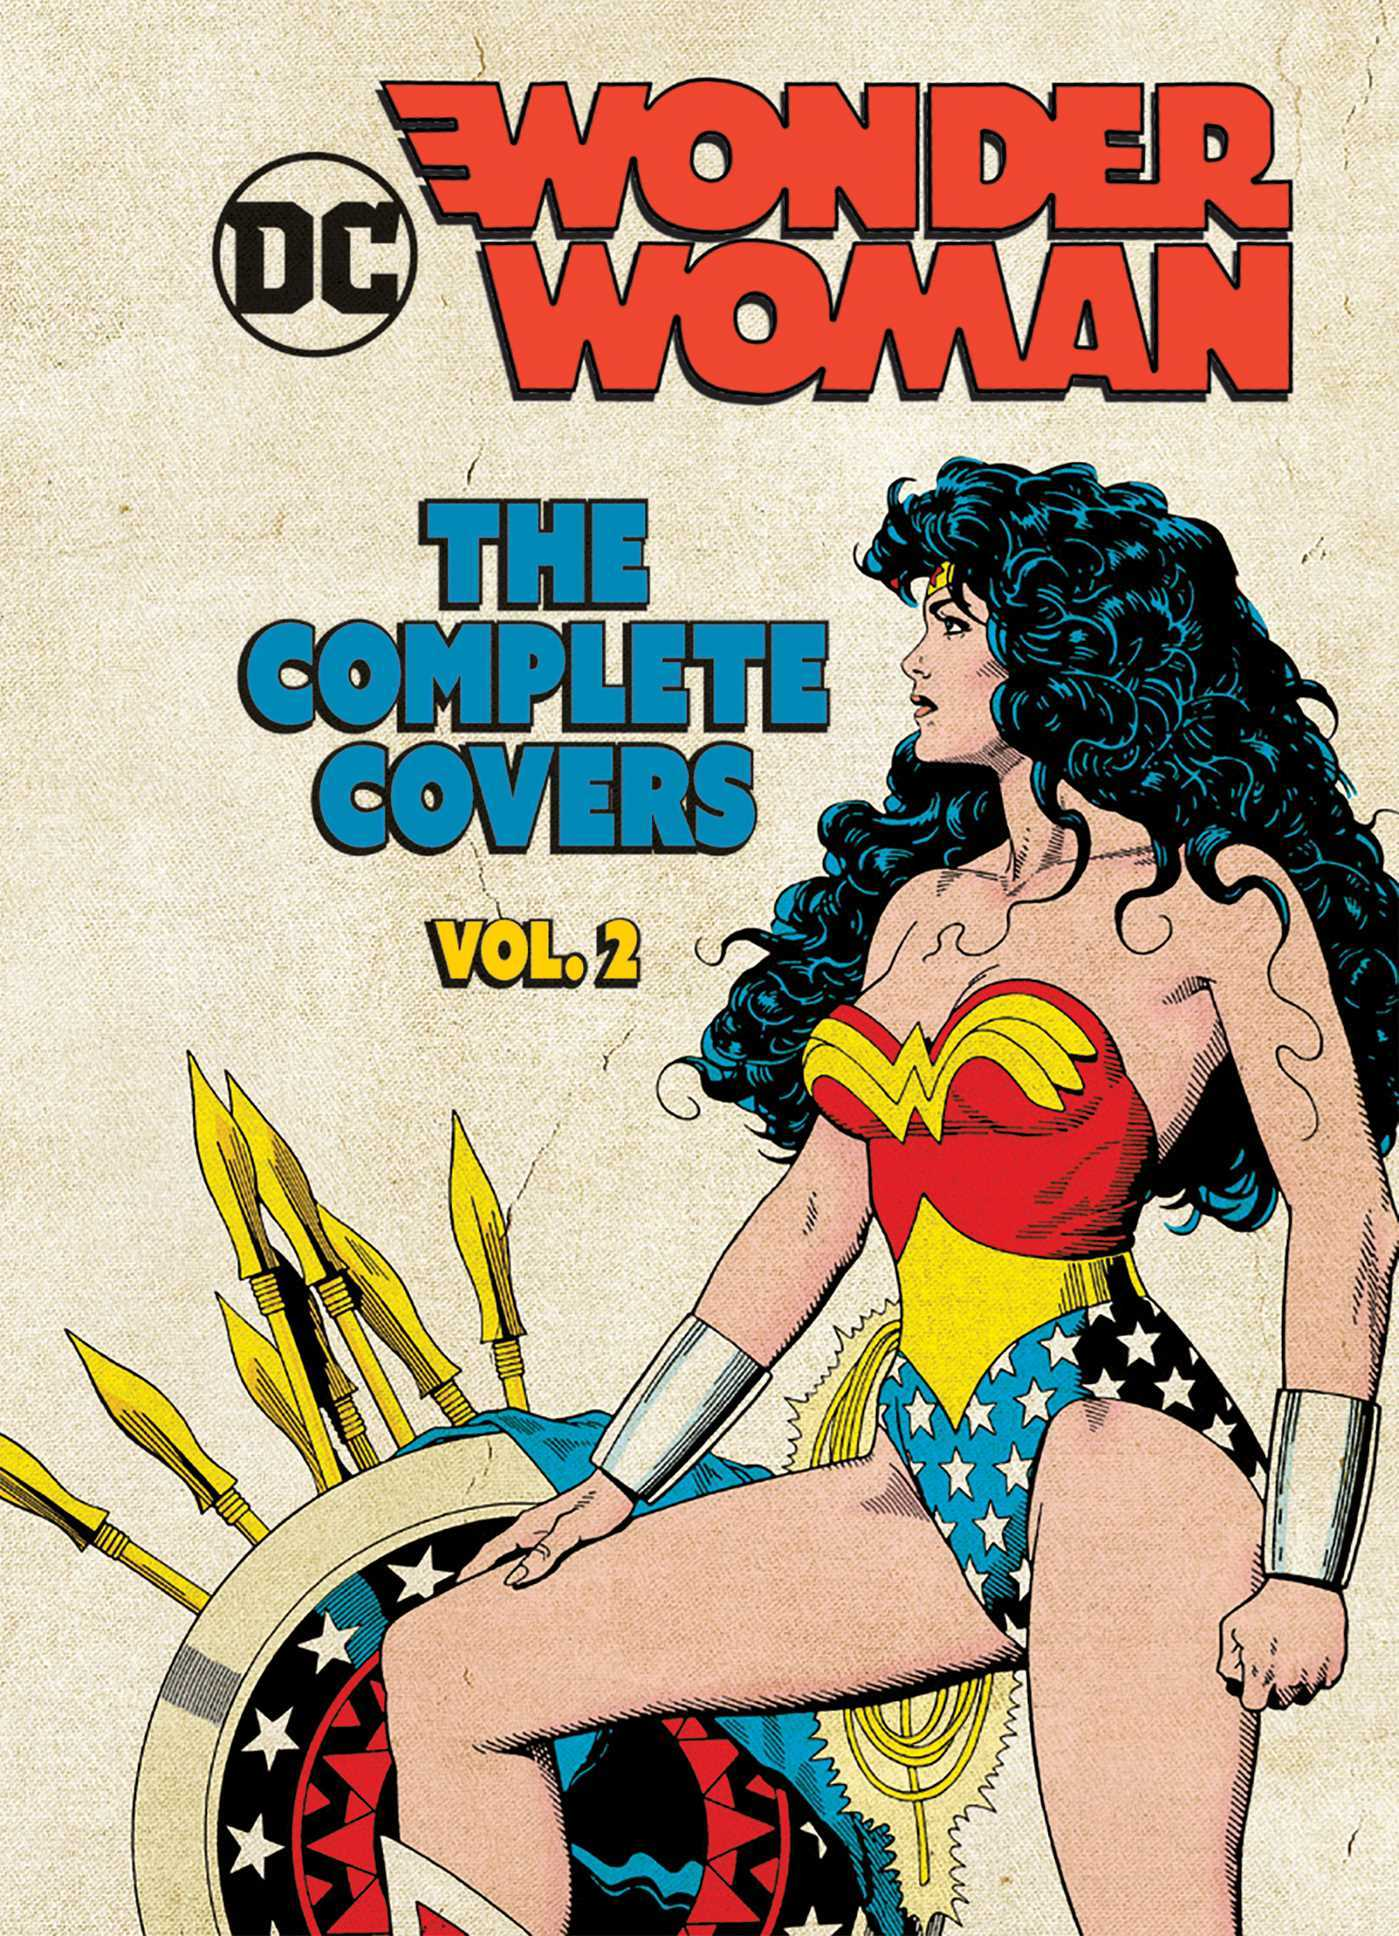 DC Comics: Wonder Woman: The Complete Covers Vol. 2